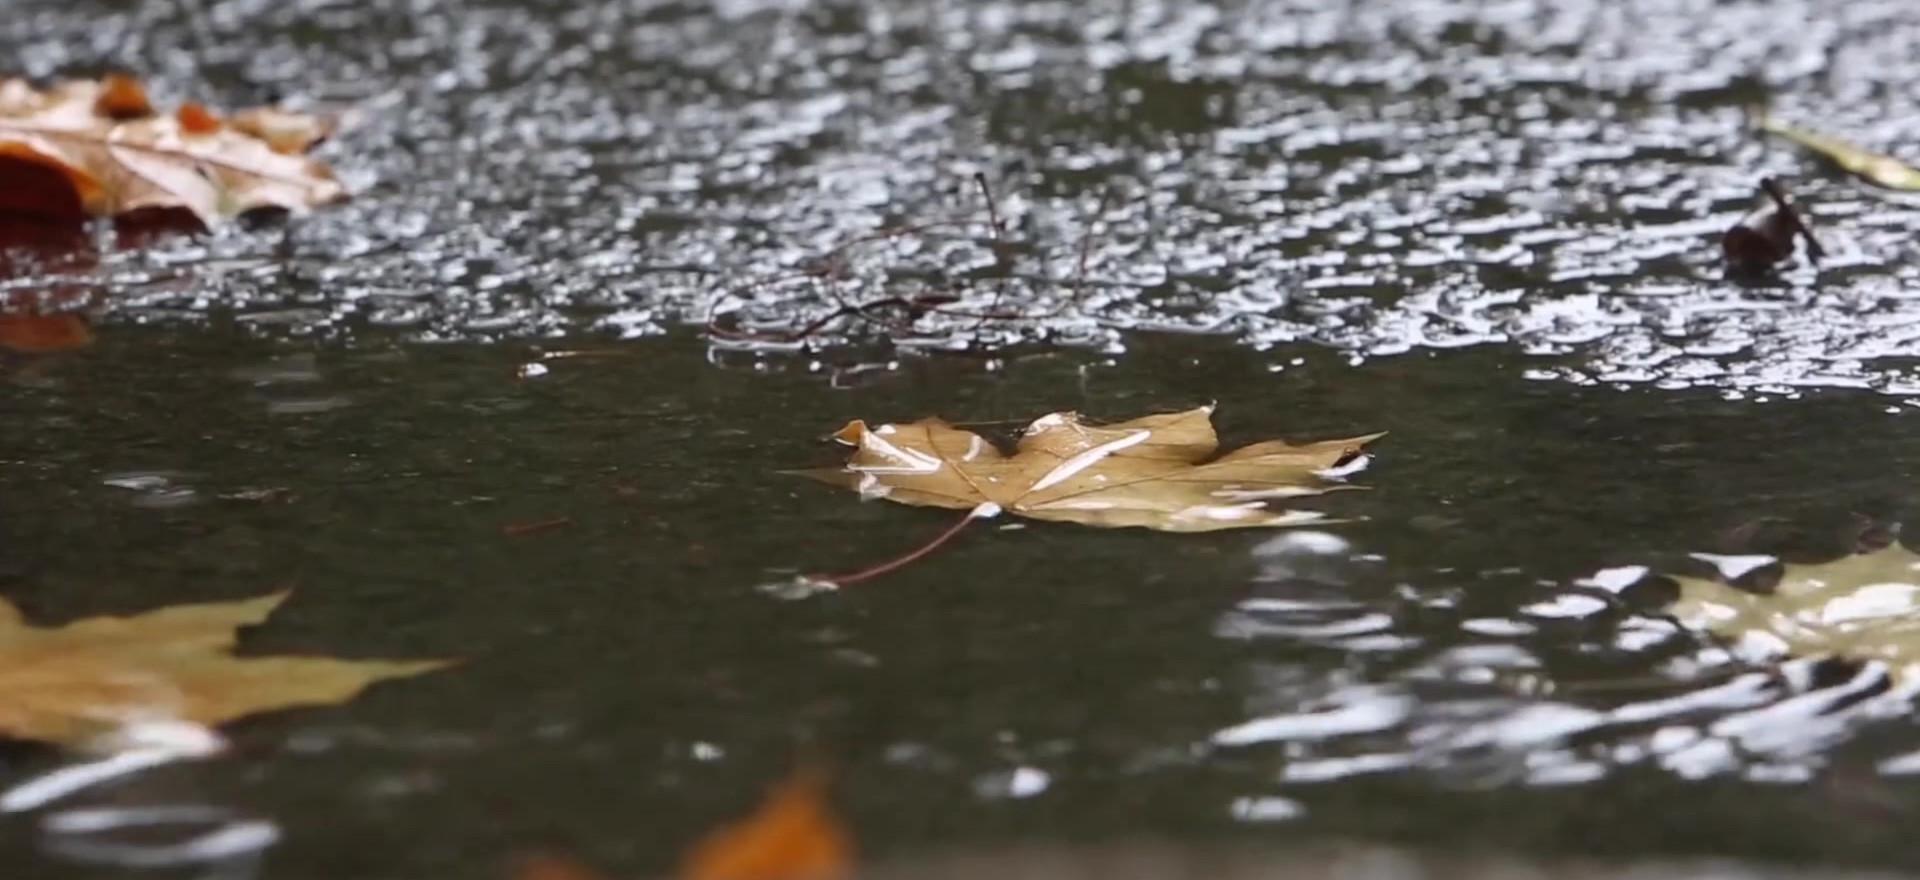 automne flaques